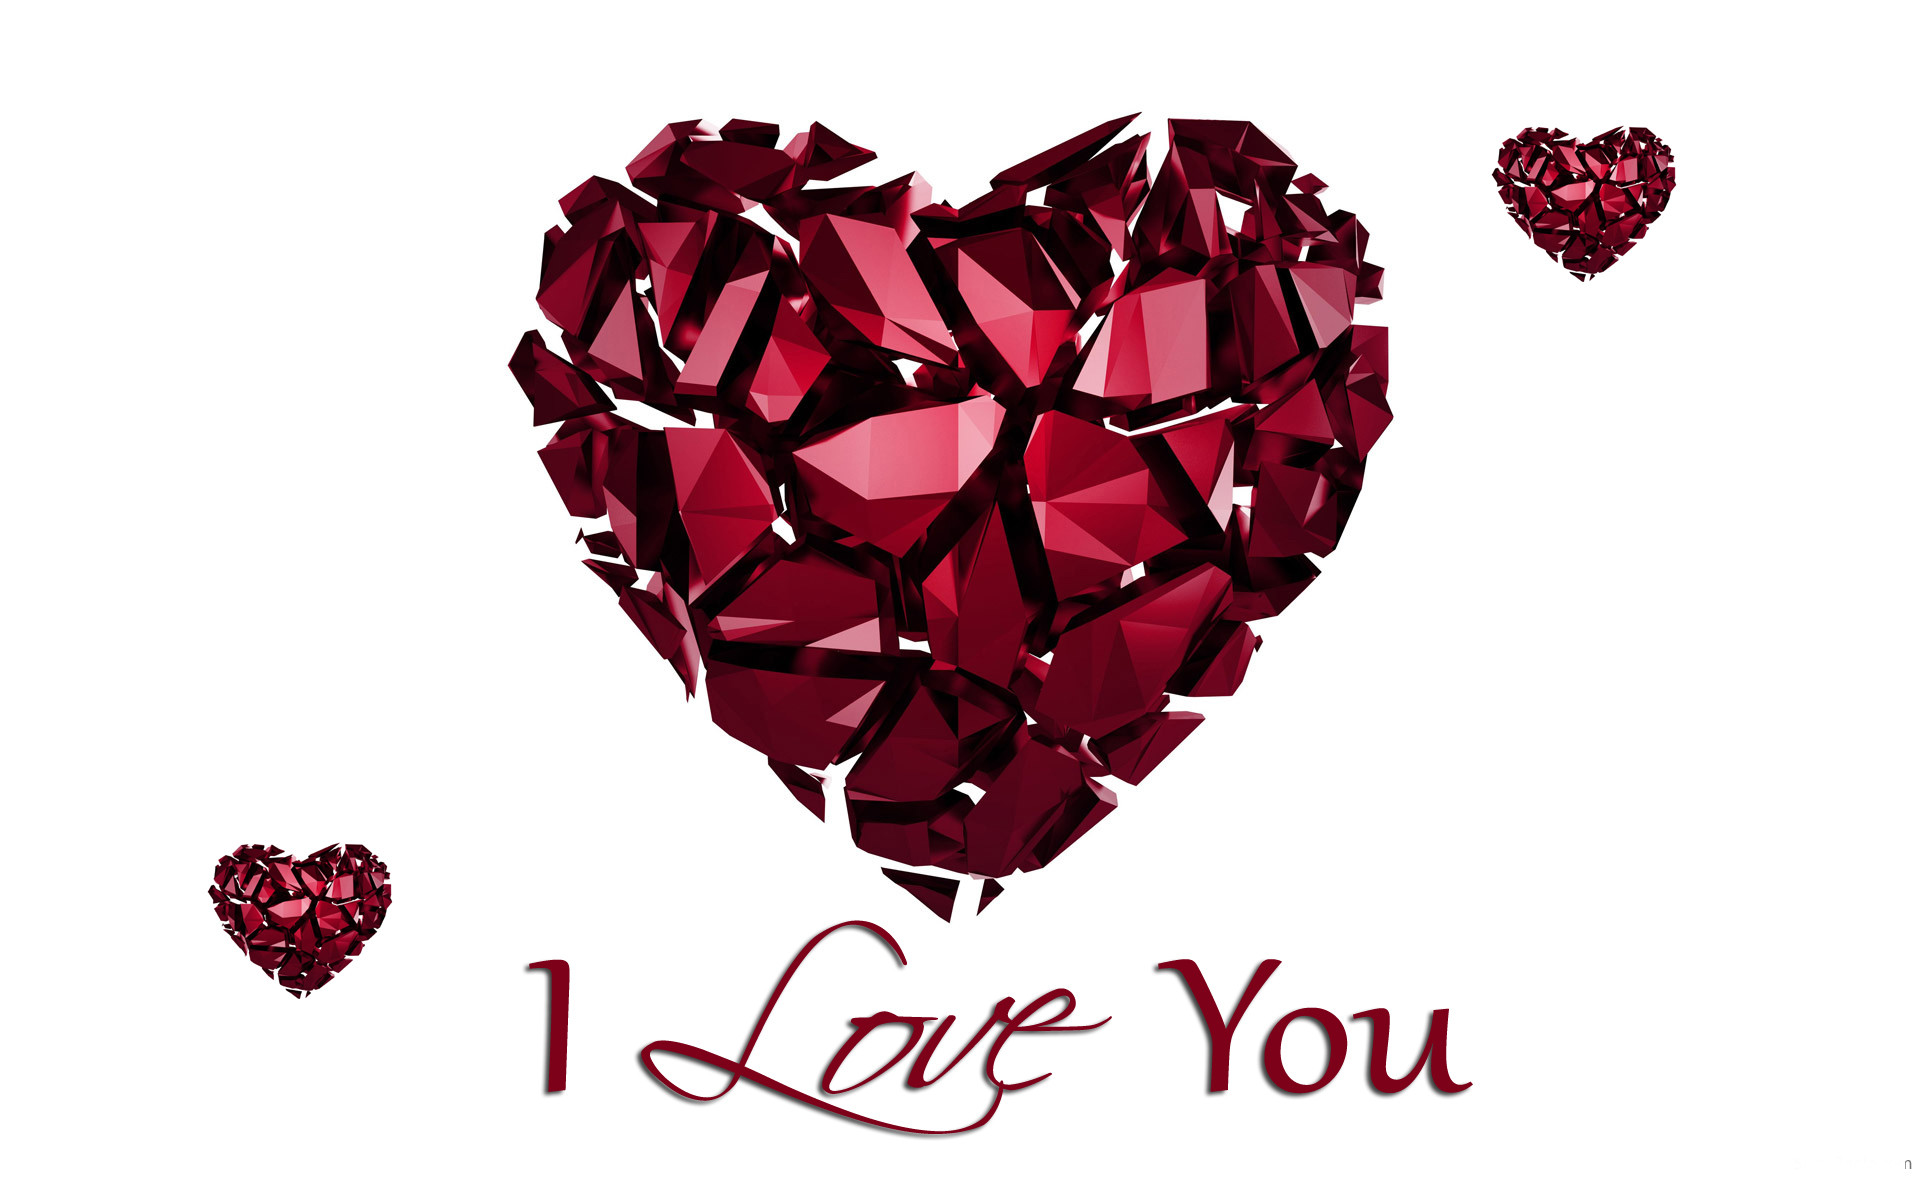 L Love You Wallpaper ①